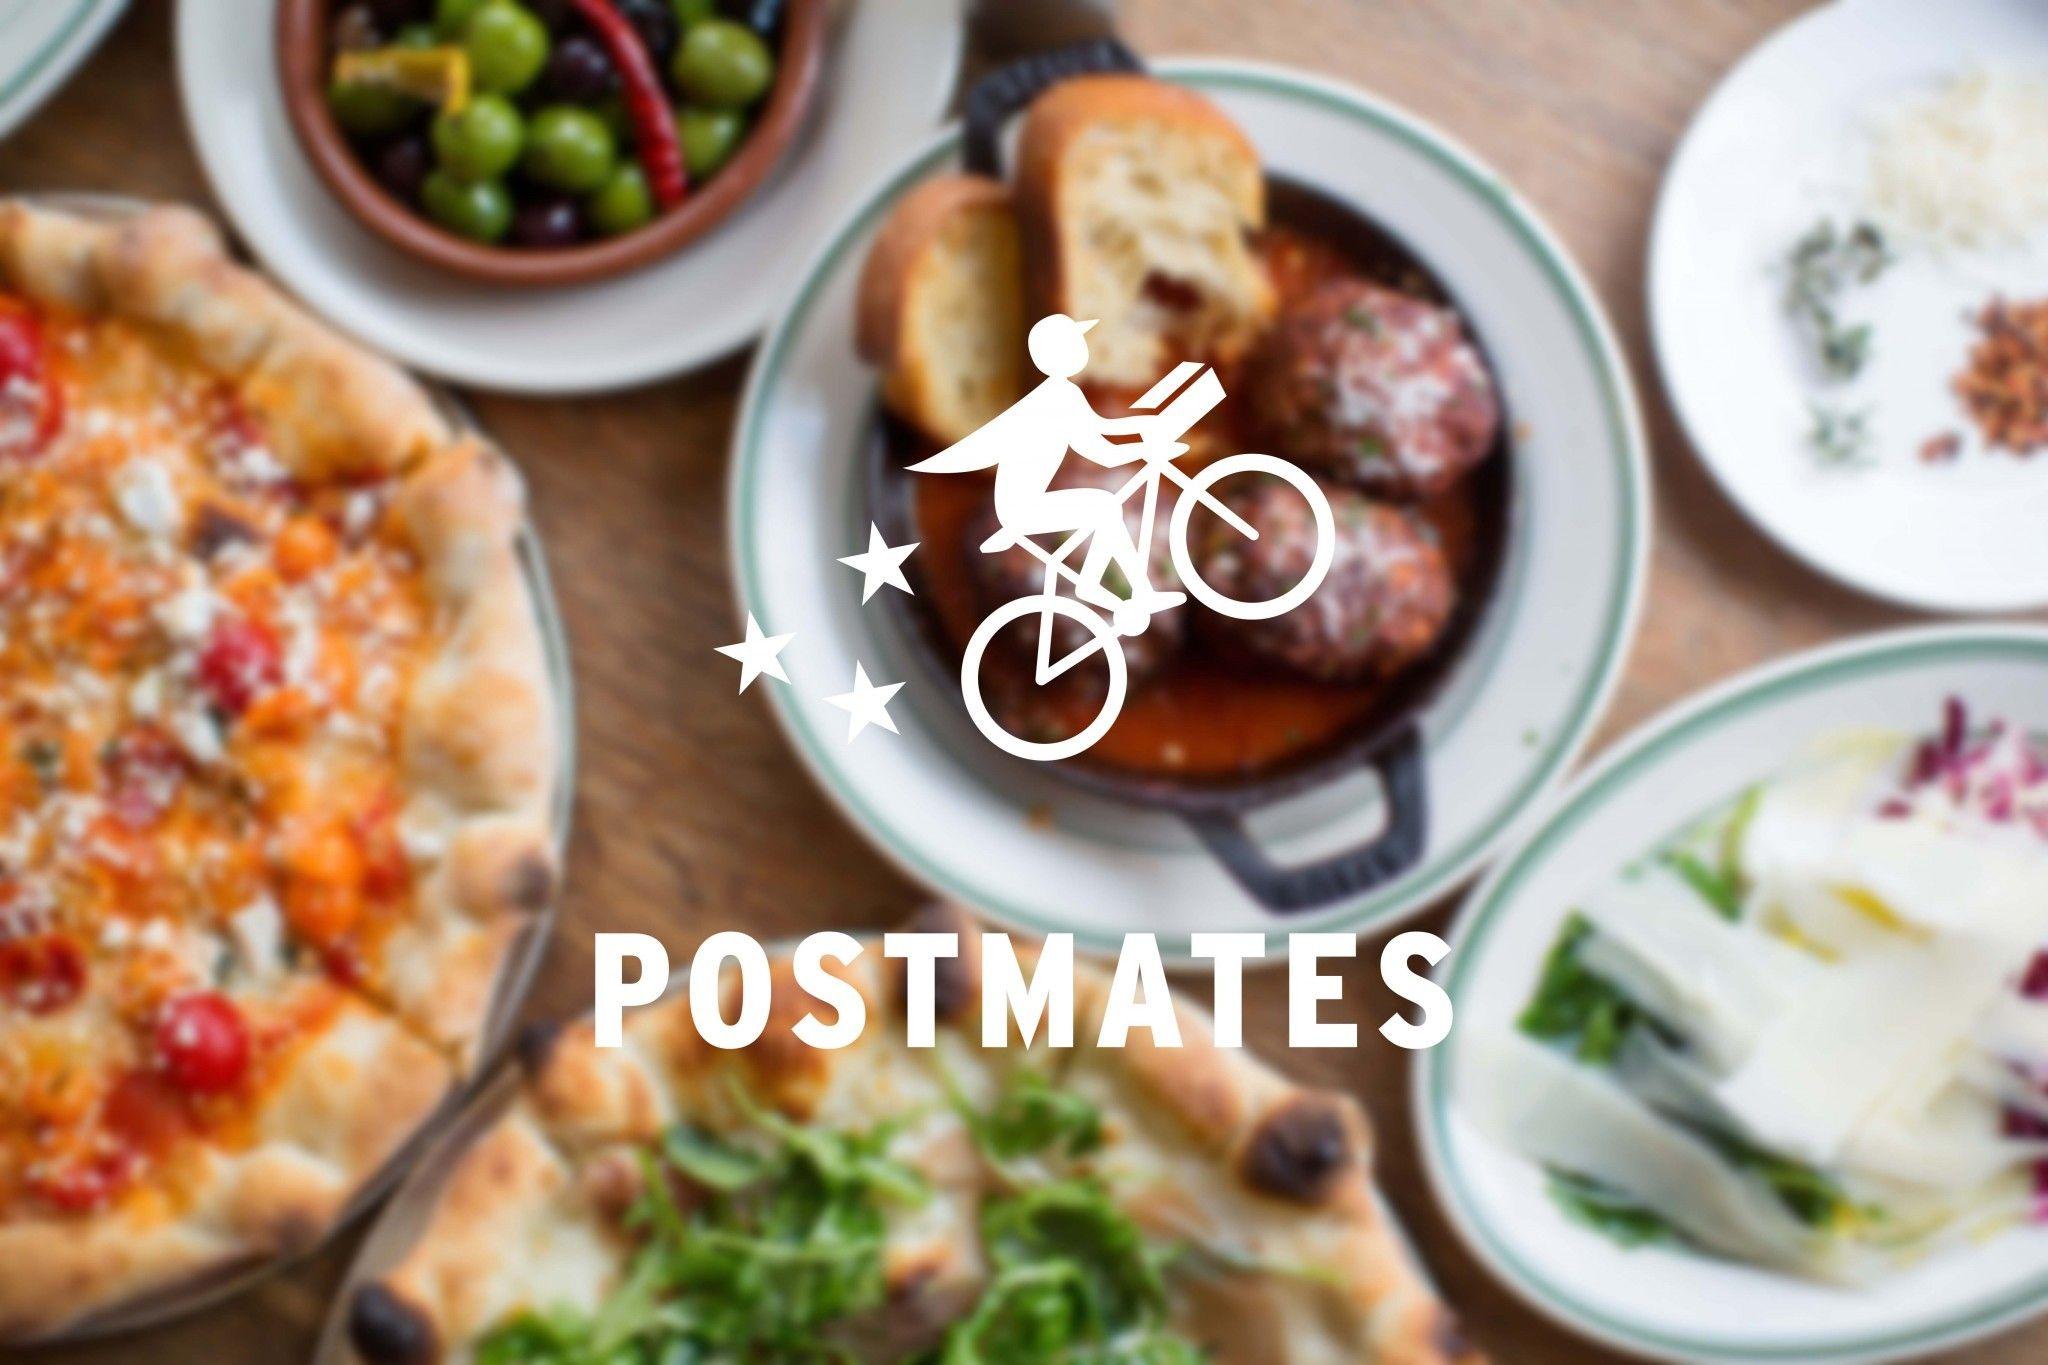 time-saving-tips-errand-edition-meet-postmates-story.jpg